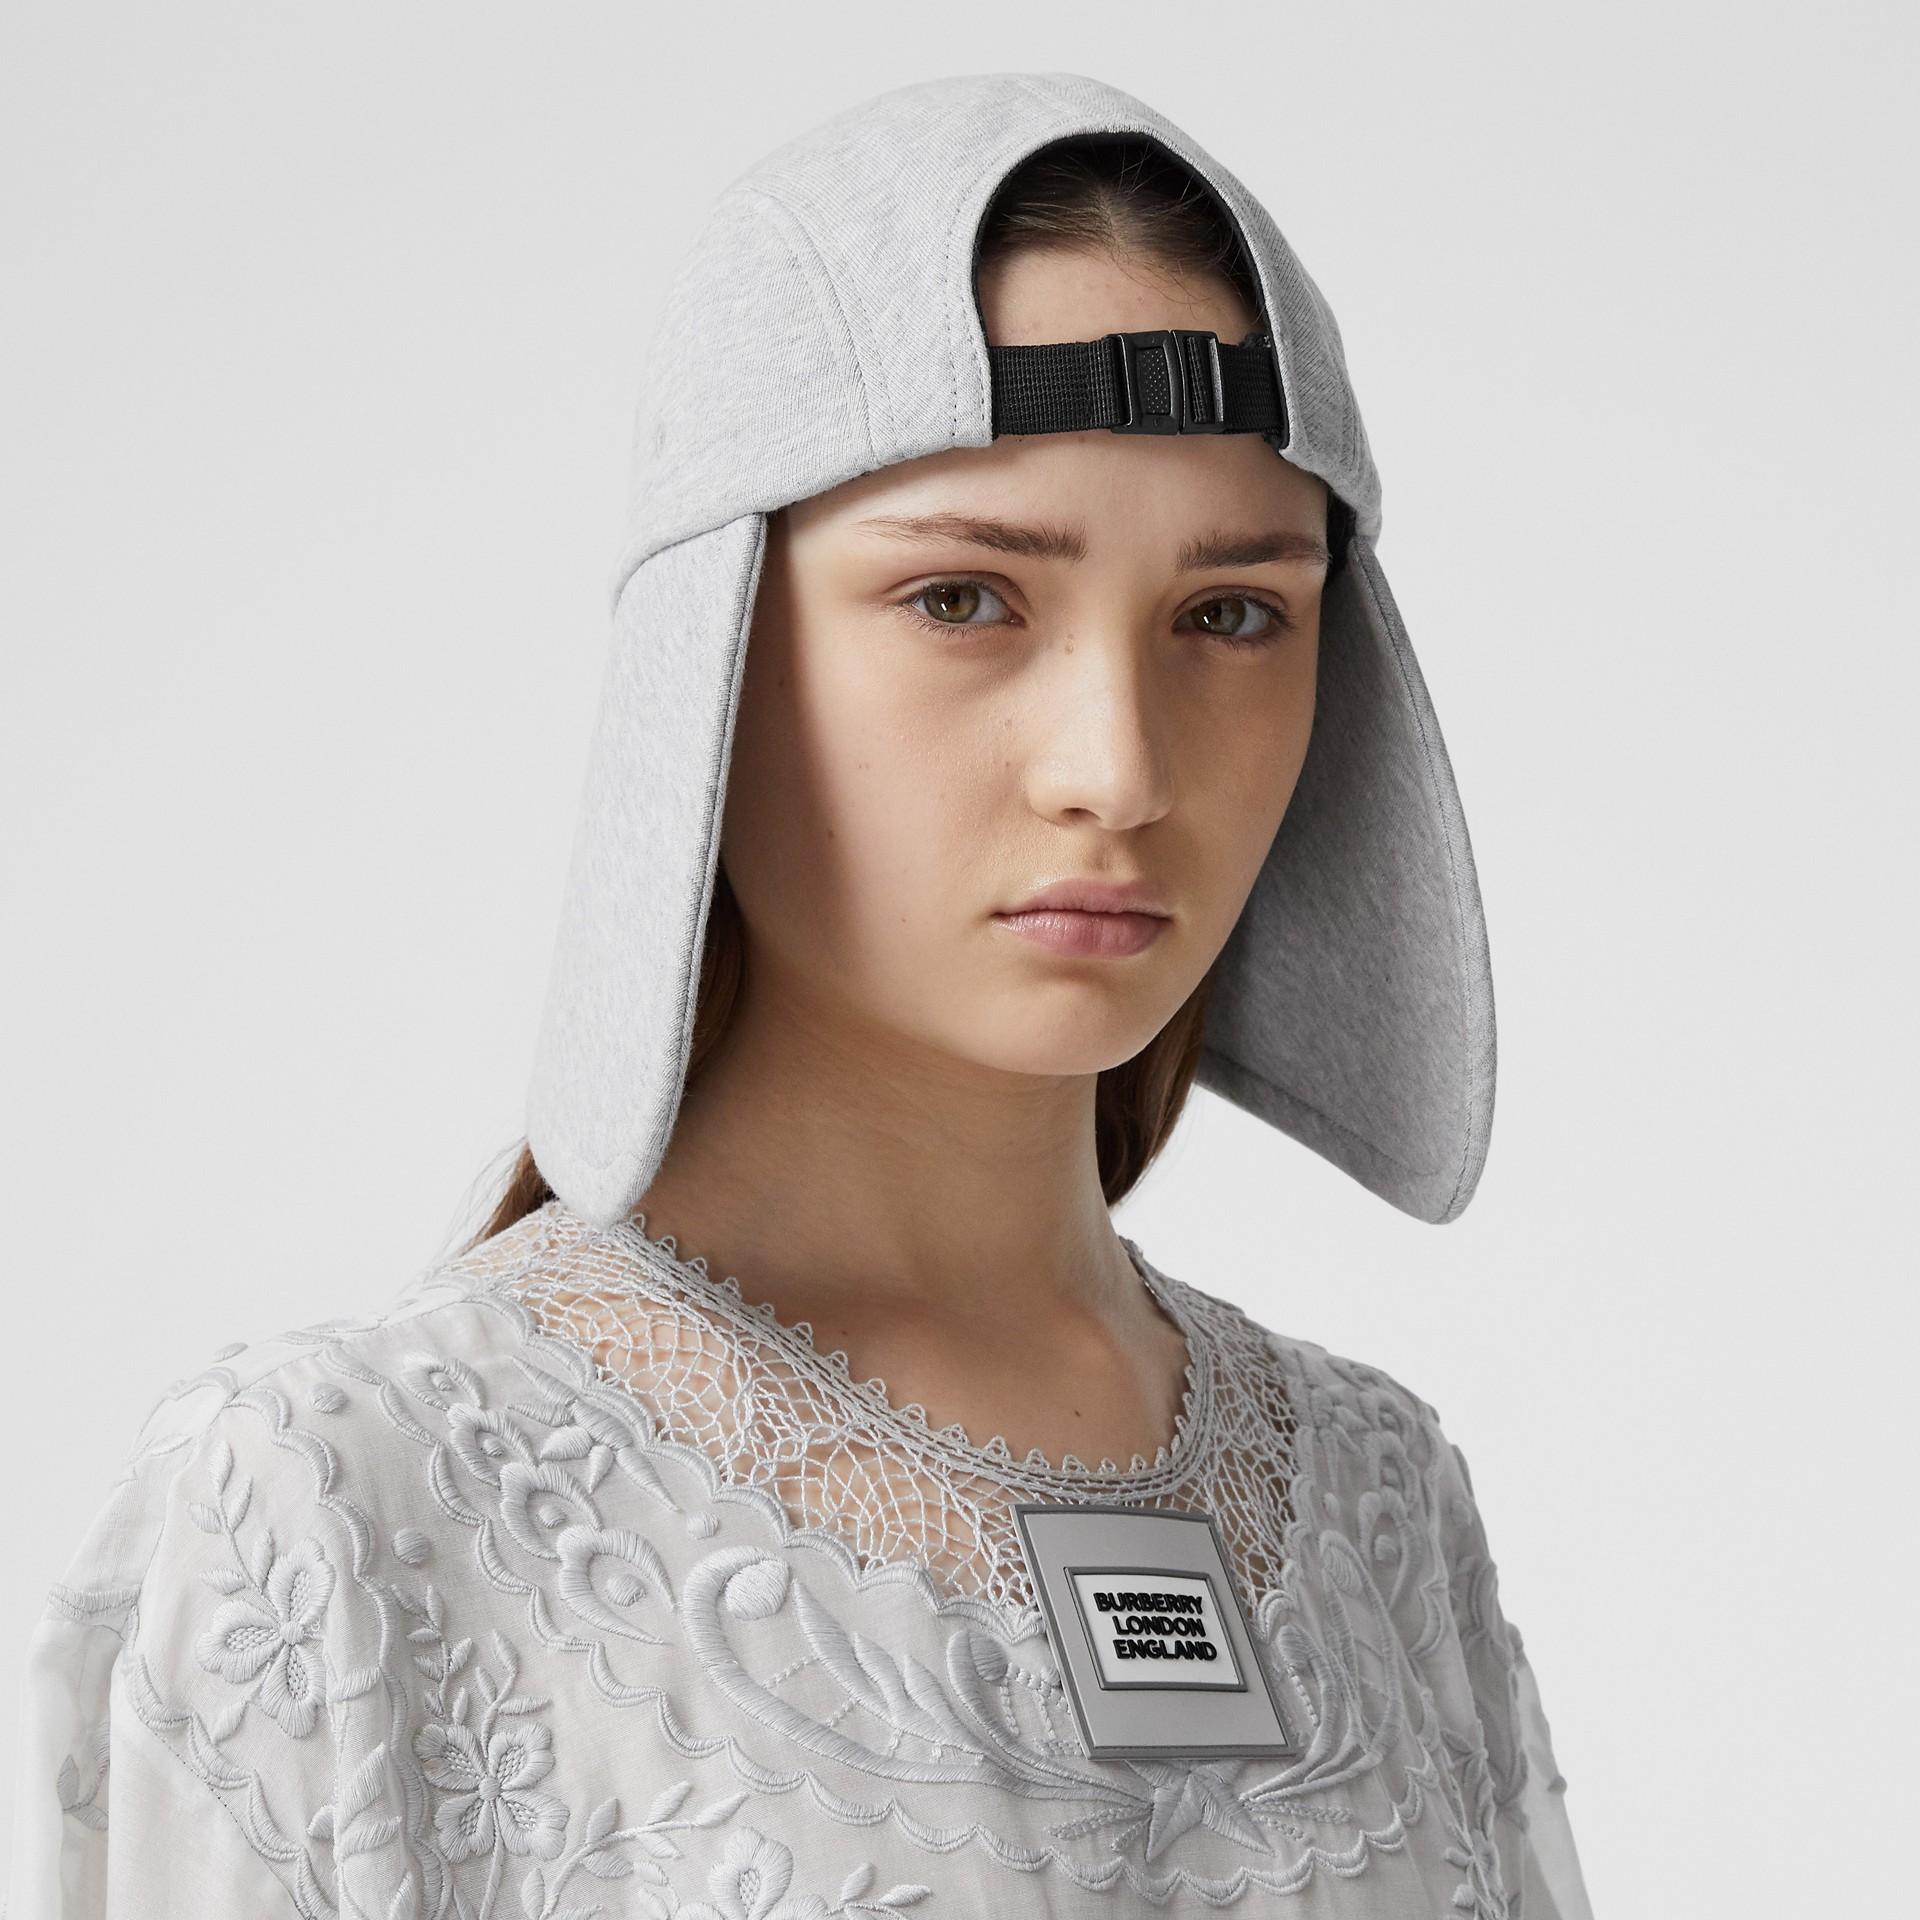 Logo Appliqué Cotton Jersey Bonnet Cap in Light Pebble Grey | Burberry - gallery image 2